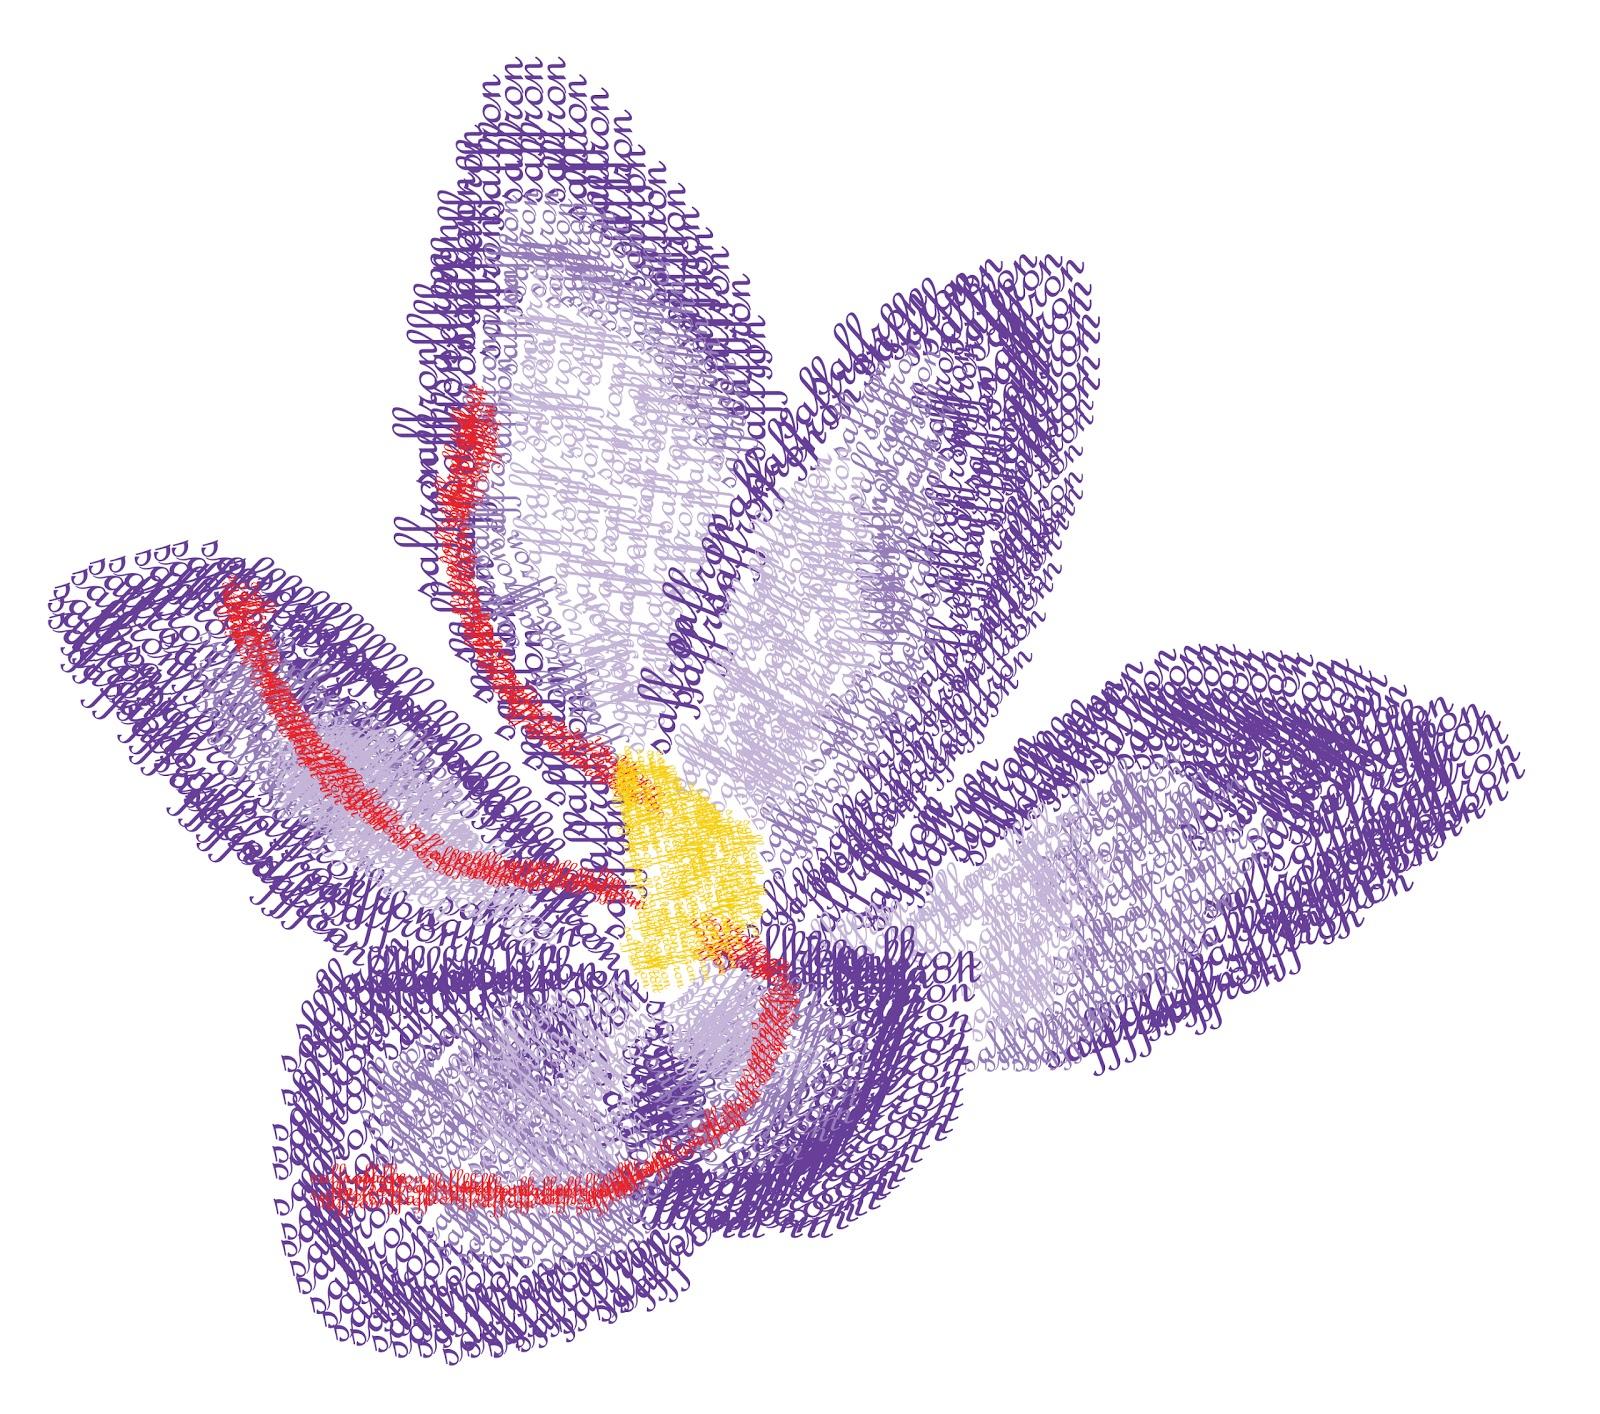 Jasmine Vanilla saffron flower type drawing and fruit